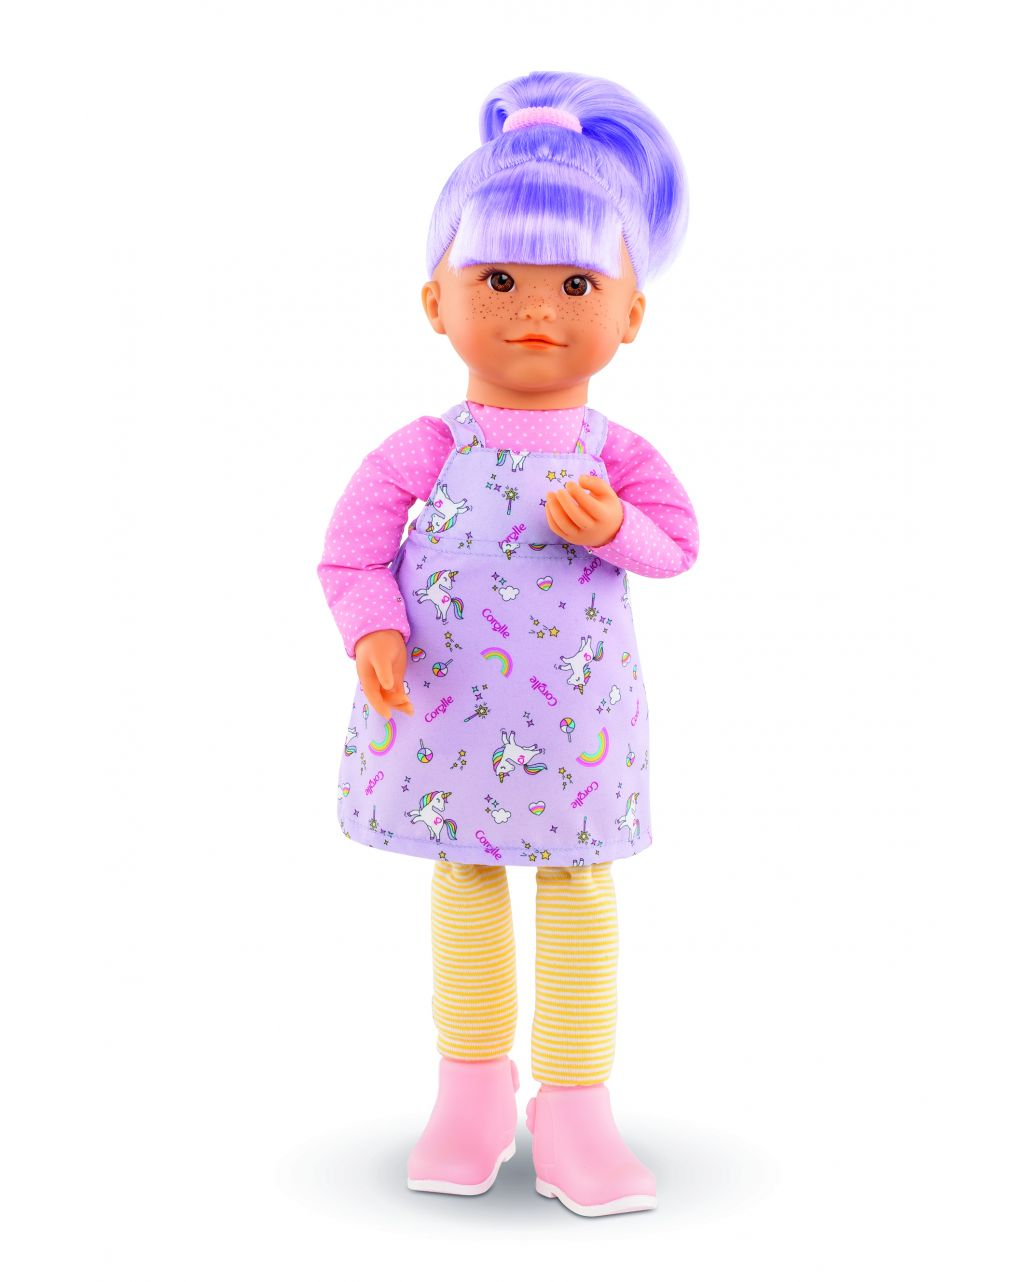 Corolle - rainbow doll - iris - Corolle